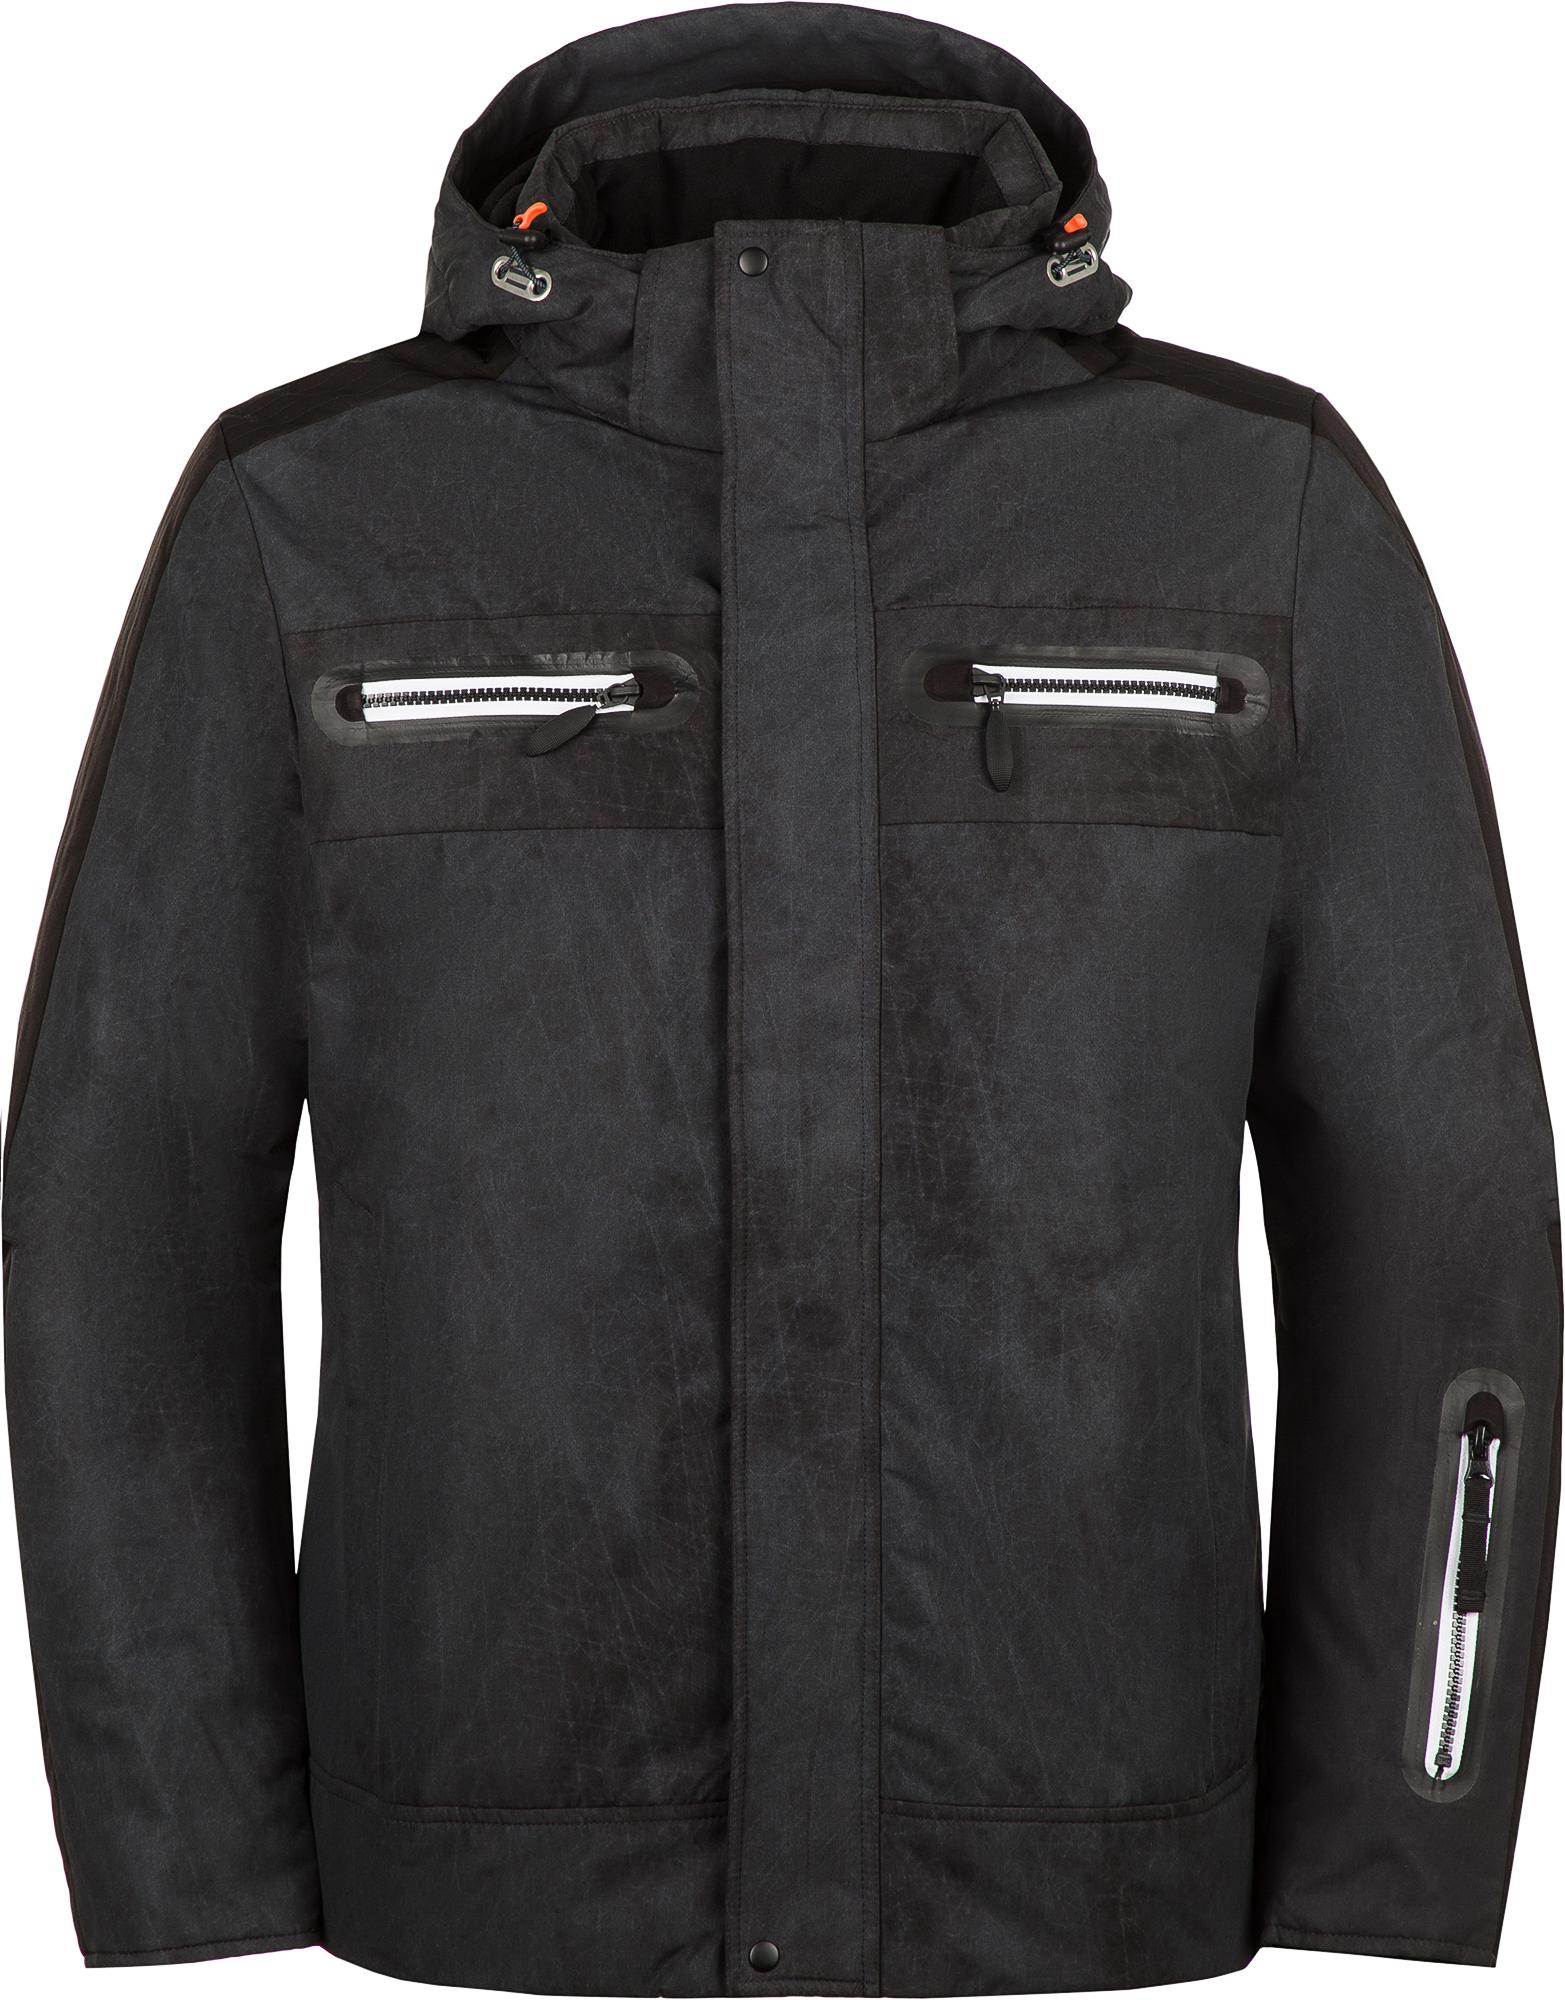 IcePeak Куртка утепленная мужская IcePeak Easton, размер 52